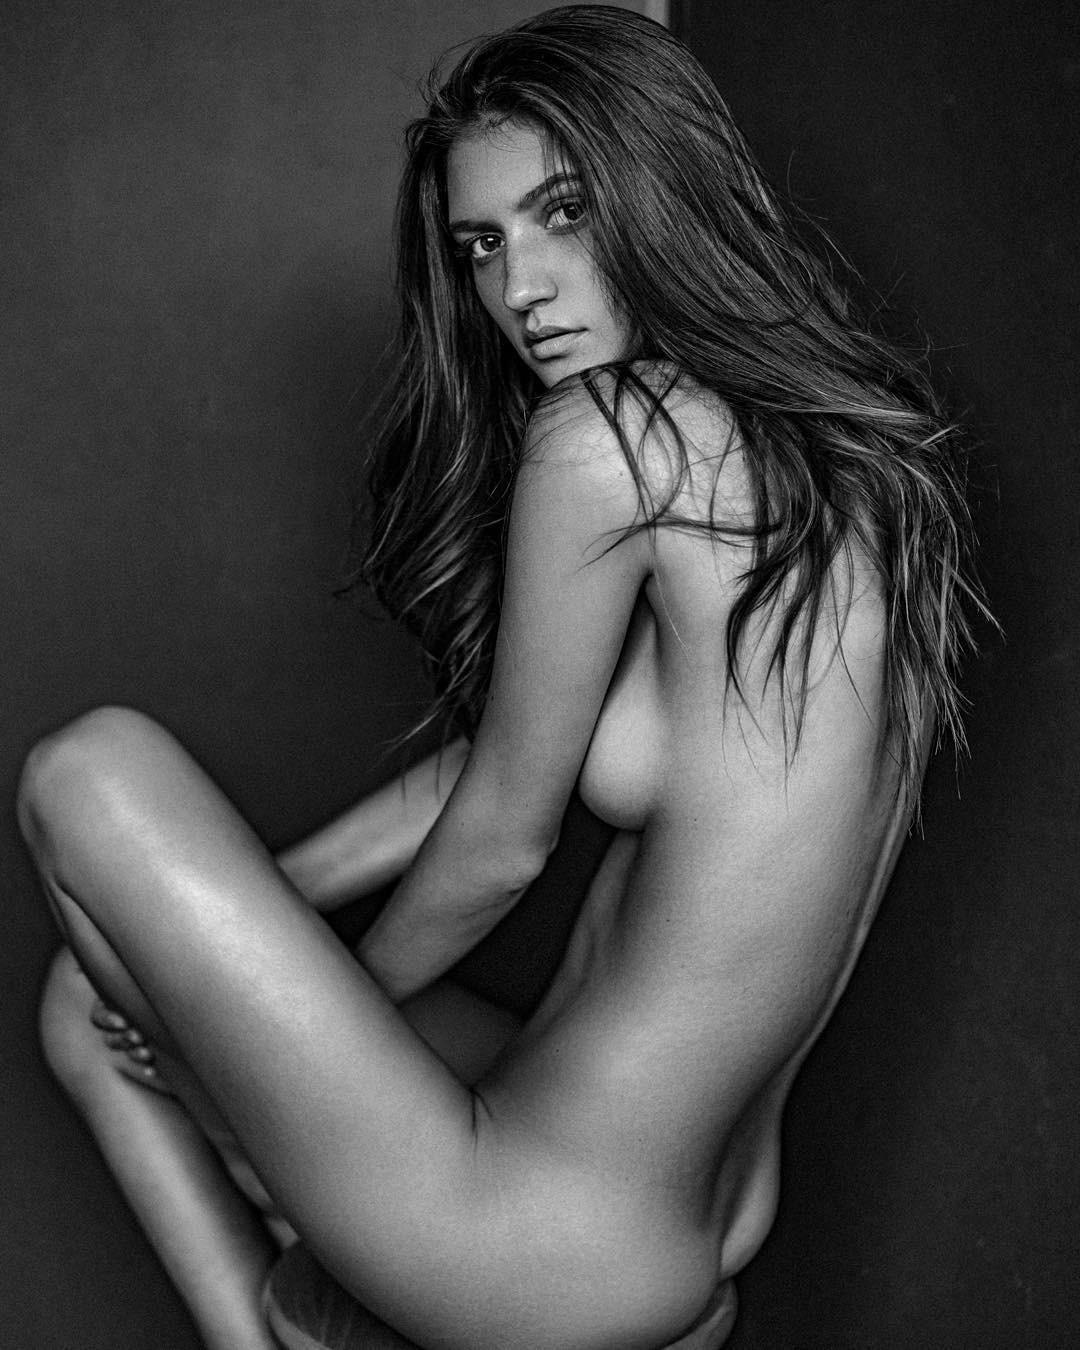 Hottest female supermodels naked #3